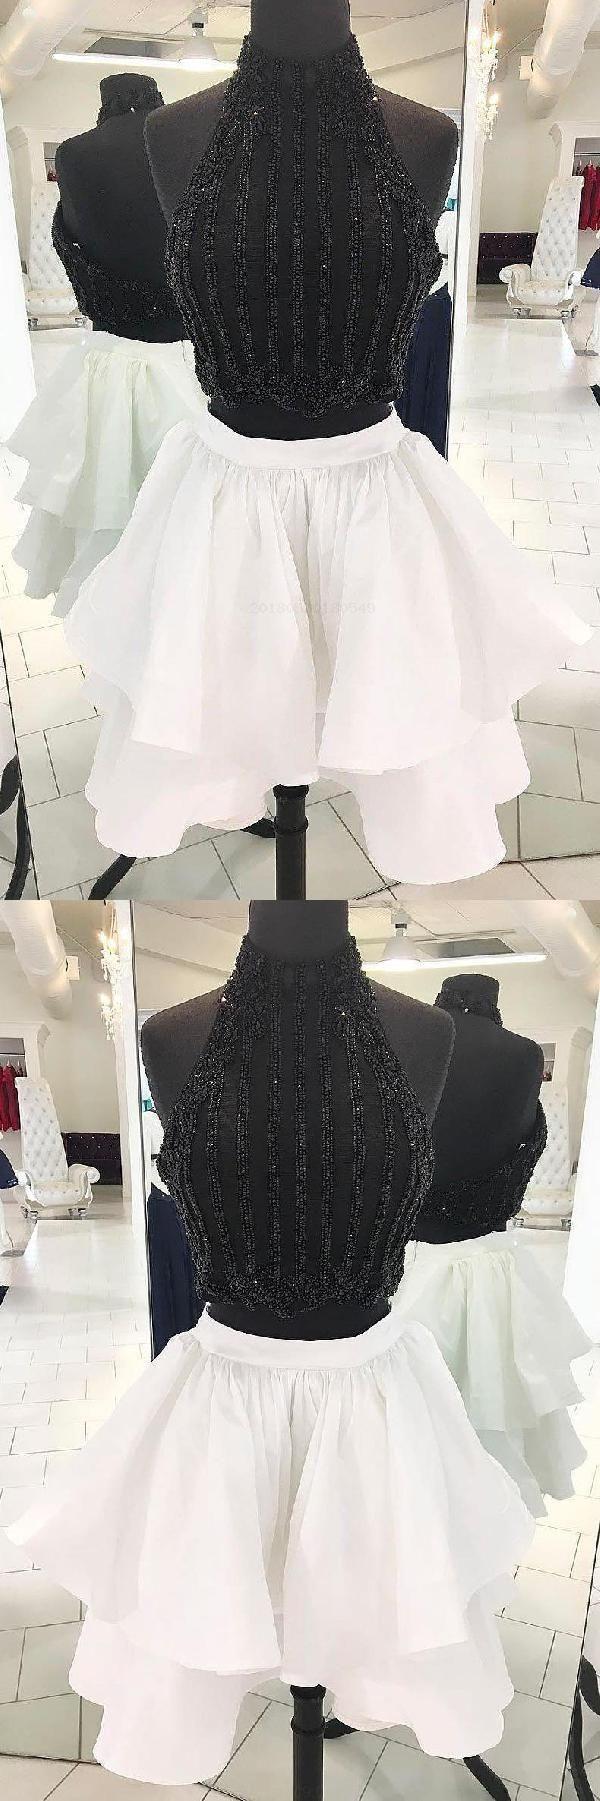 Prom dresses short black prom dresses prom dresses two piece